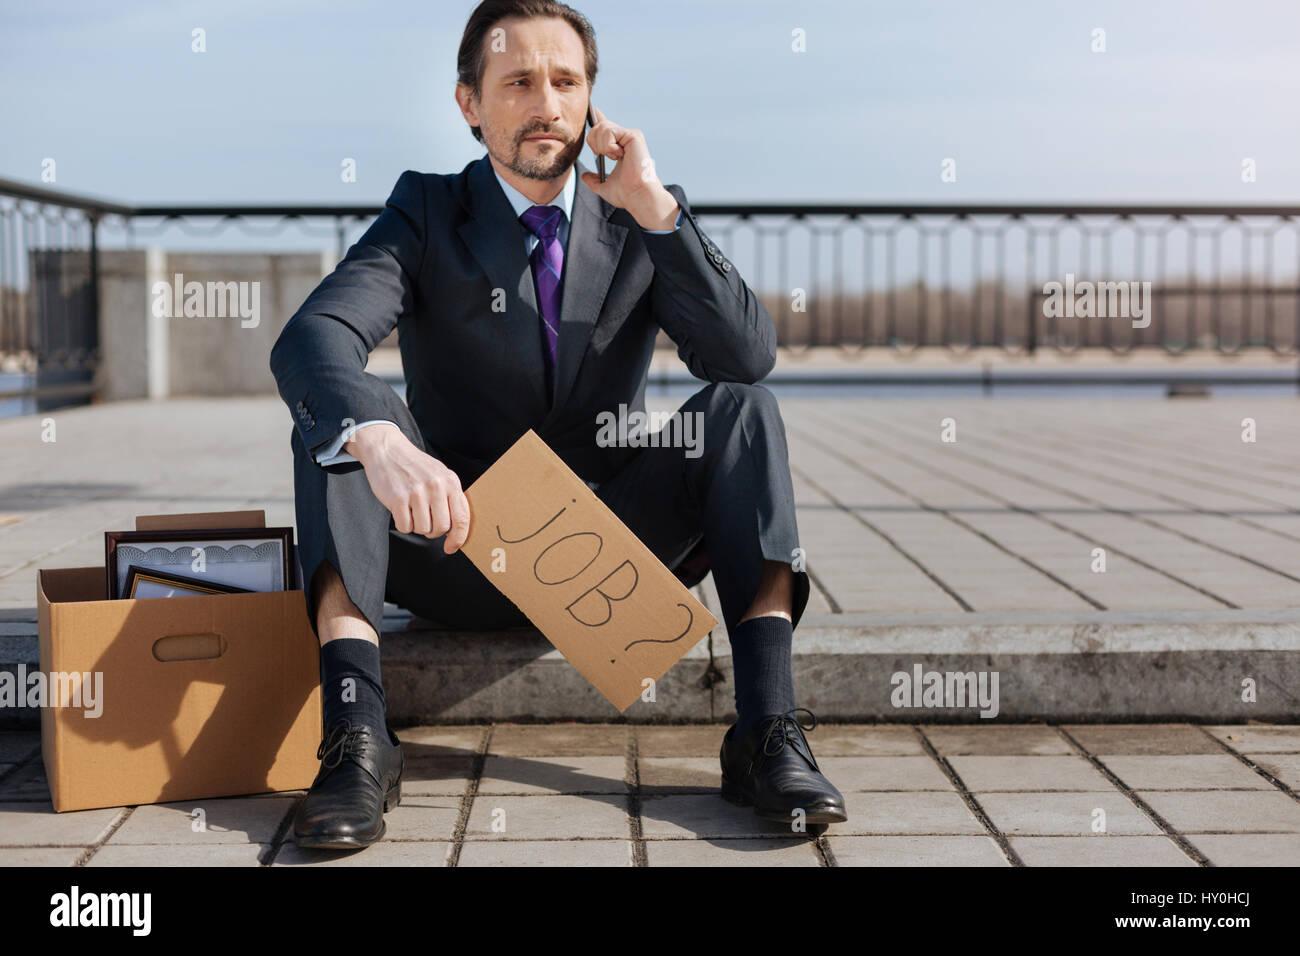 Jobless man waiting for new vacancies - Stock Image